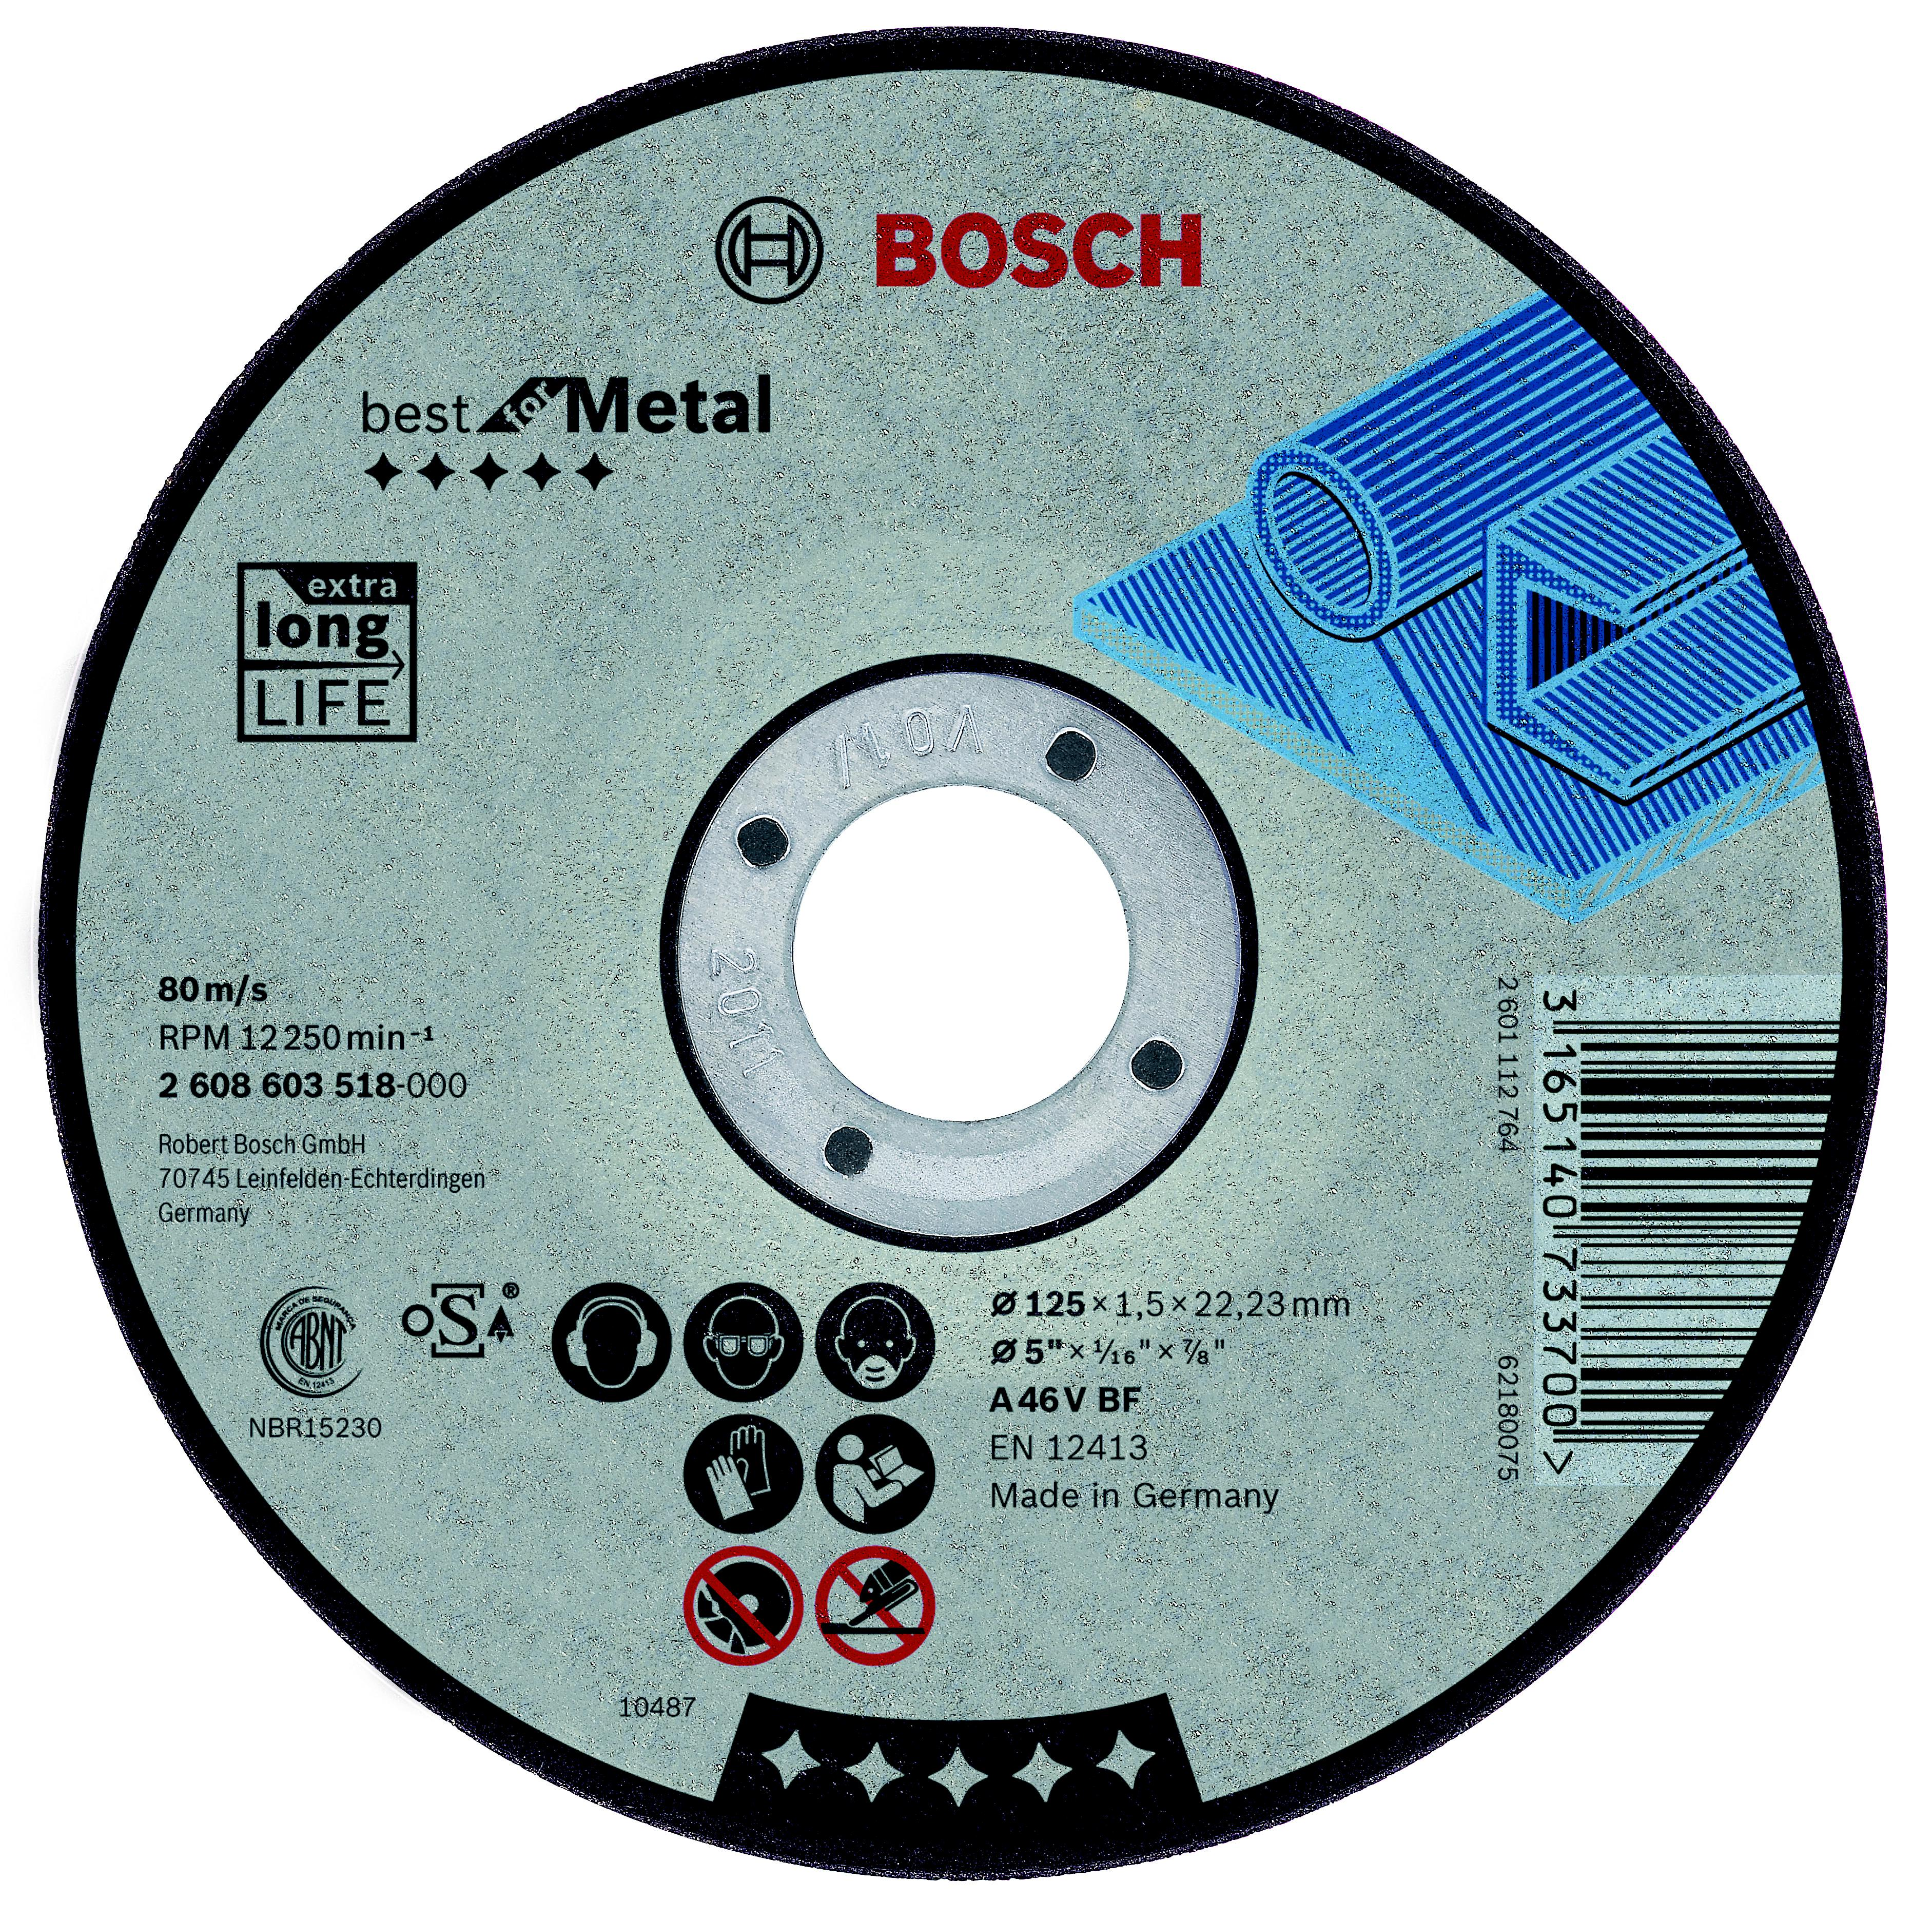 Круг отрезной Bosch 125х1.5х22 best for metal (2.608.603.519) круг отрезной bosch 115х1 5х22 best for metal 2 608 603 517